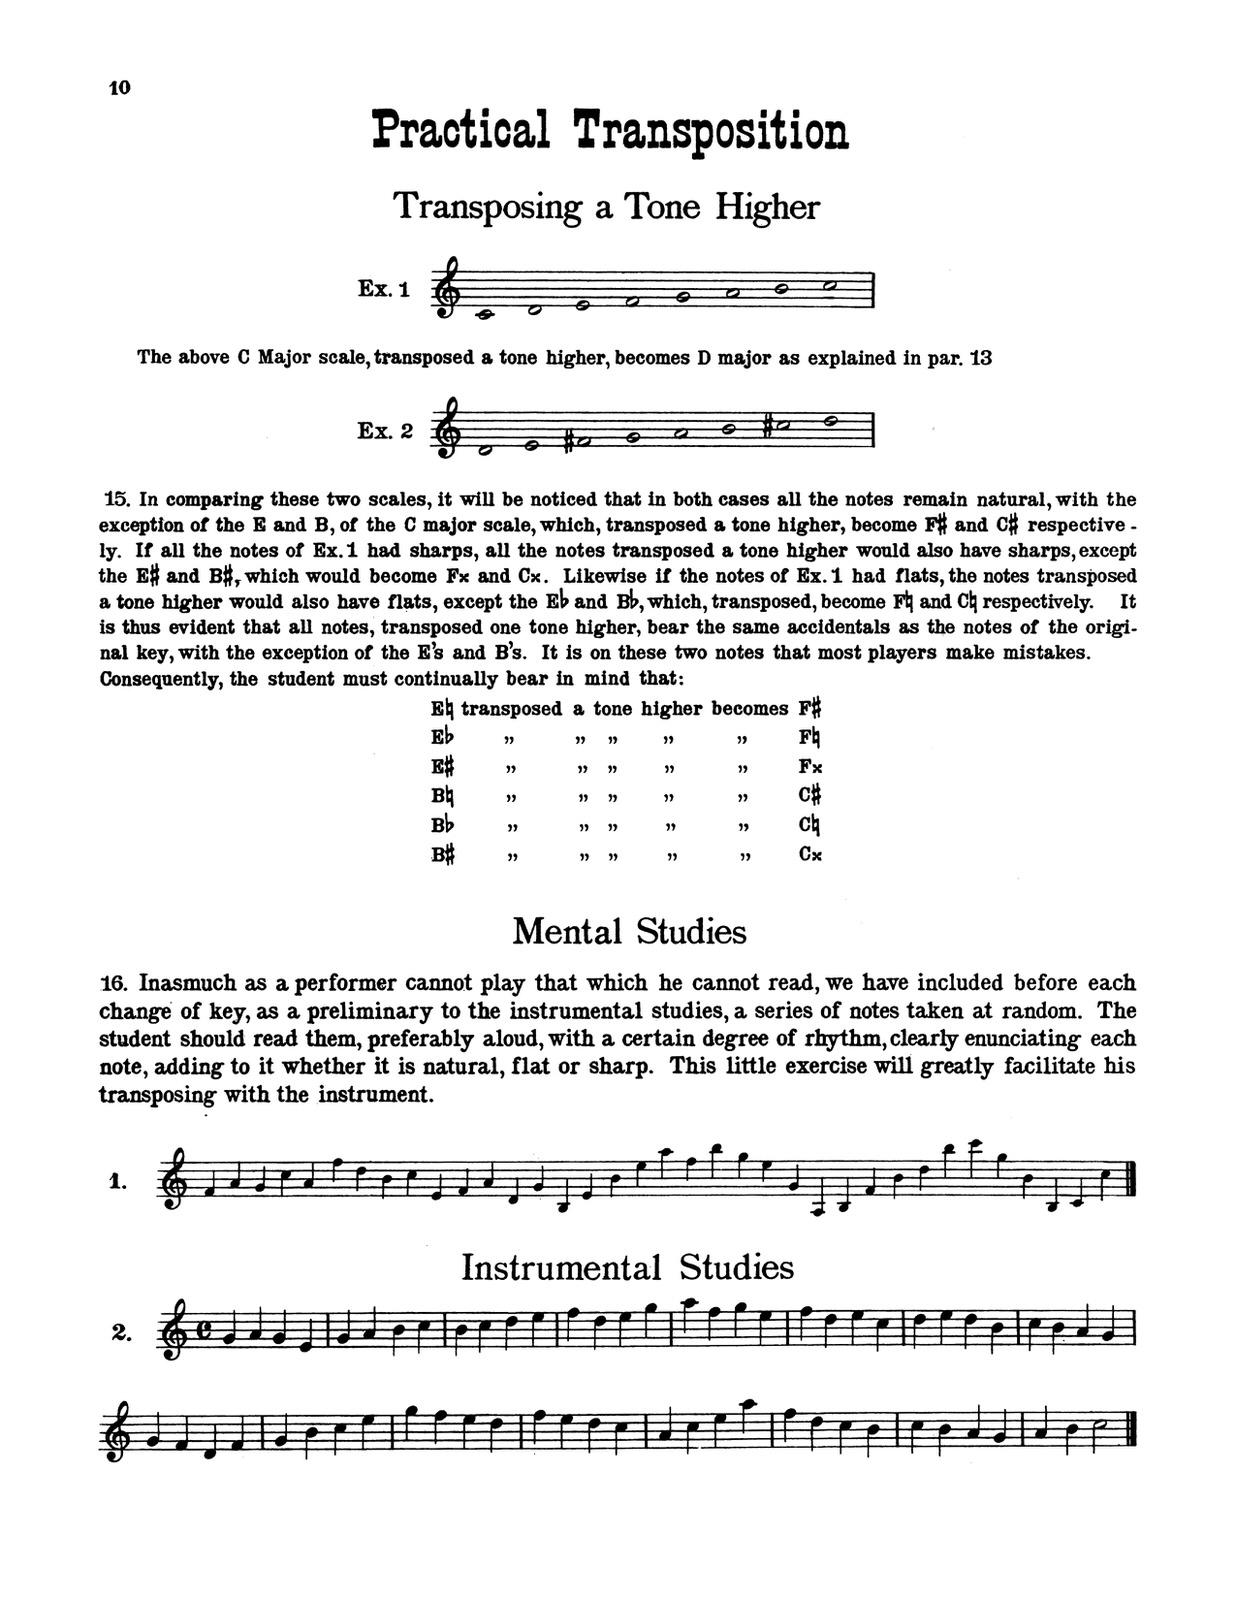 Langenus, Gustave, Practical Transposition for Trumpet-p10